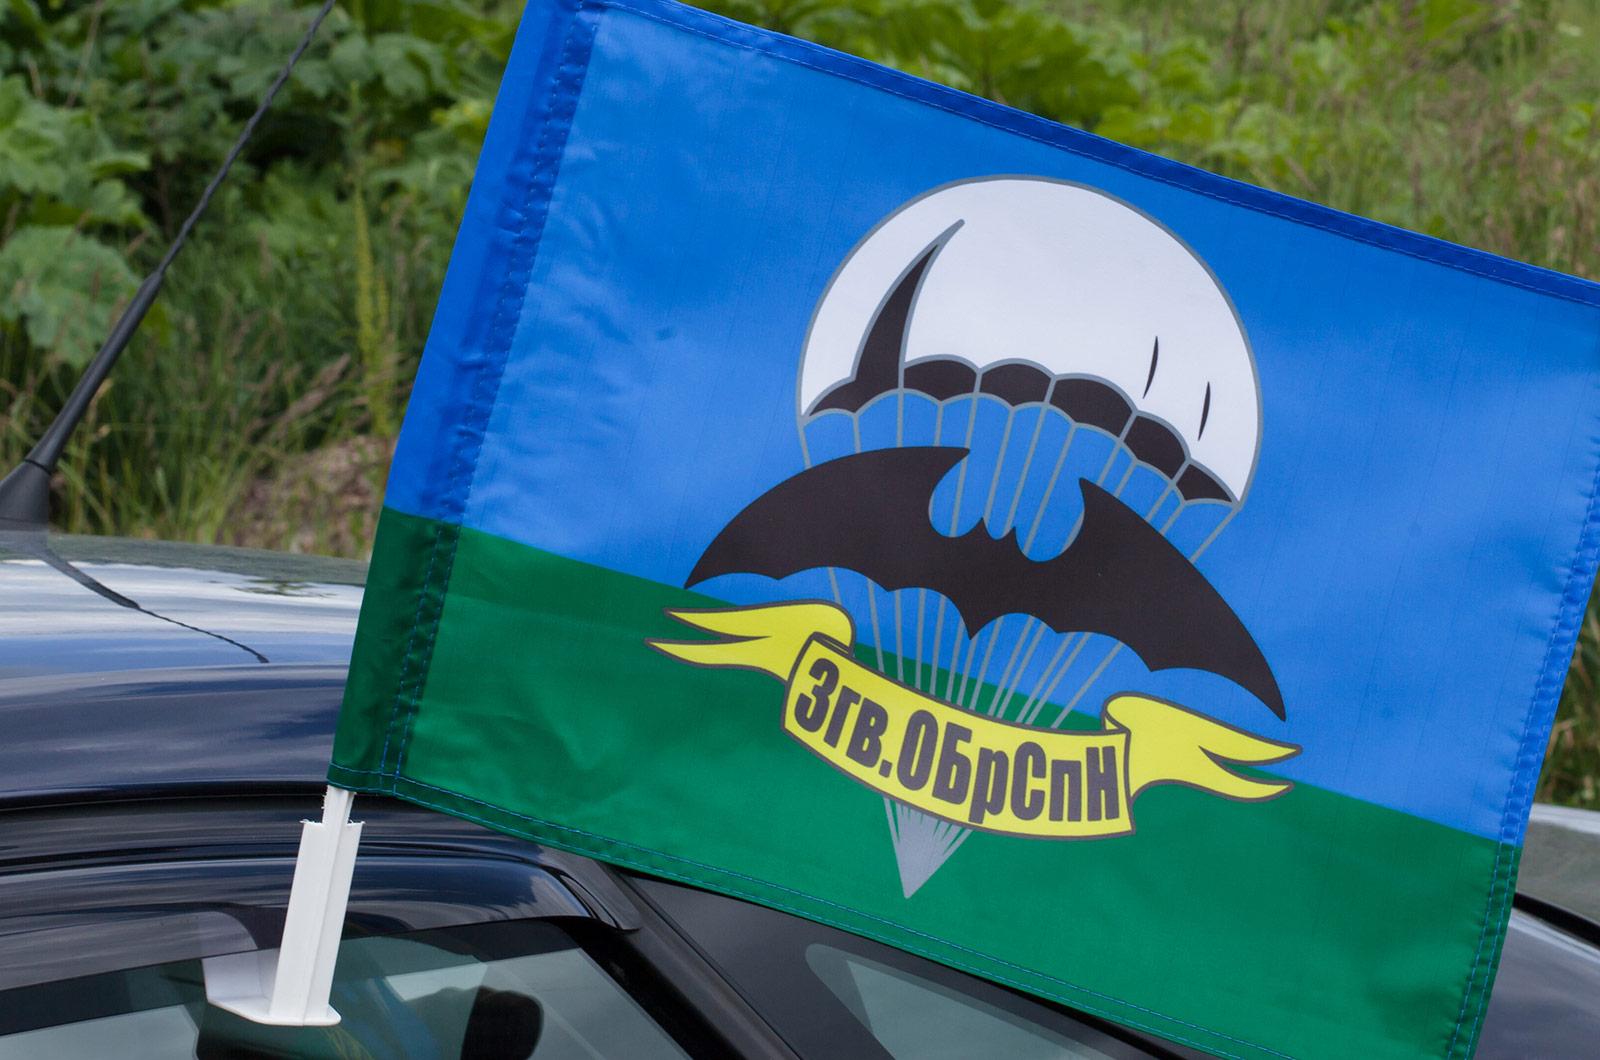 http://image.voenpro.ru/flag-na-mashinu-s-kronshtejnom-spetsnaza-gru-3gv-obrspn-21208-101.jpg